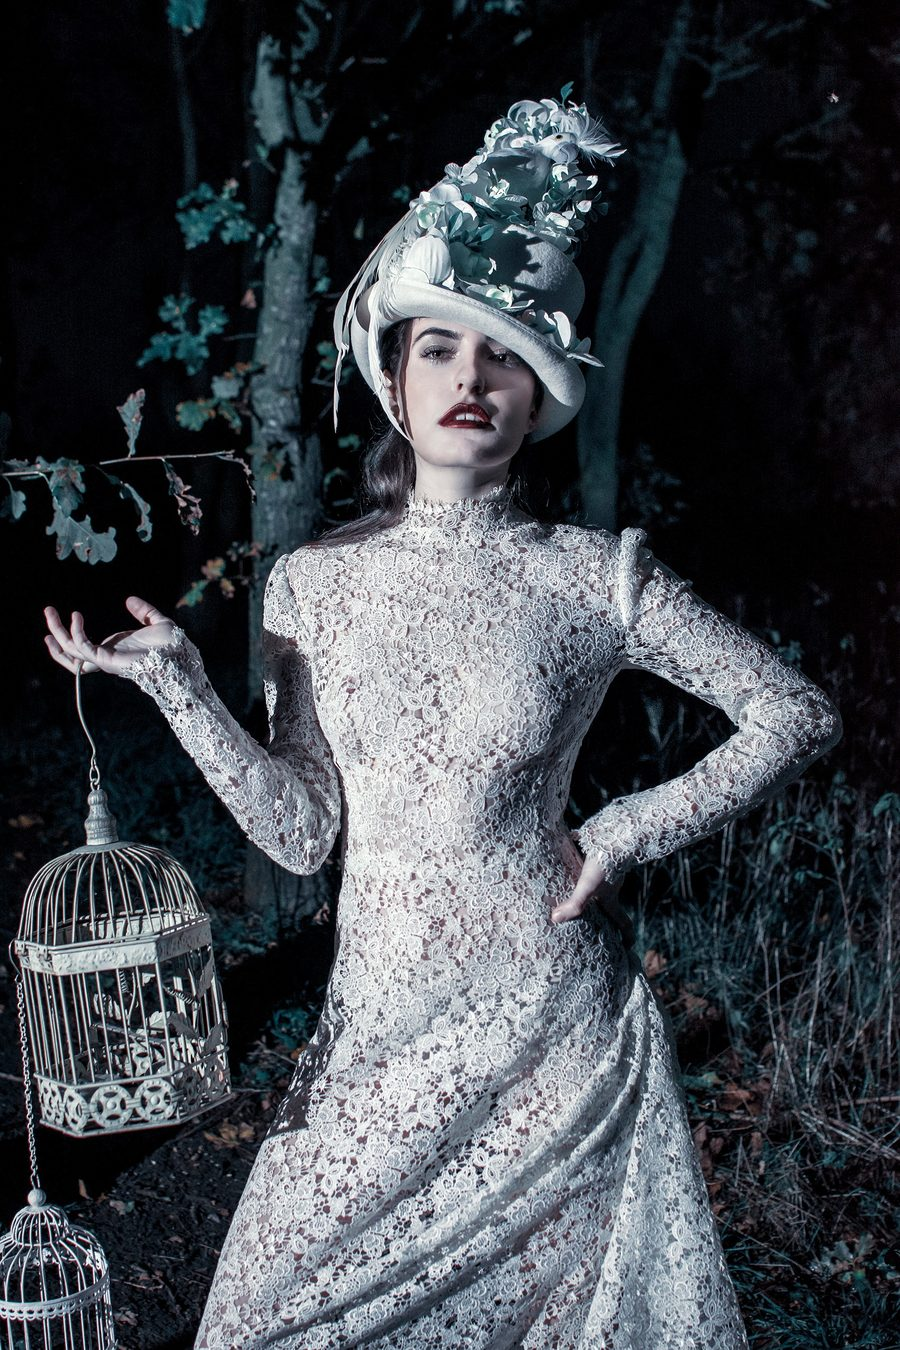 Makeup by creative beauty with Ameliajmua / Uploaded 27th January 2020 @ 01:53 PM